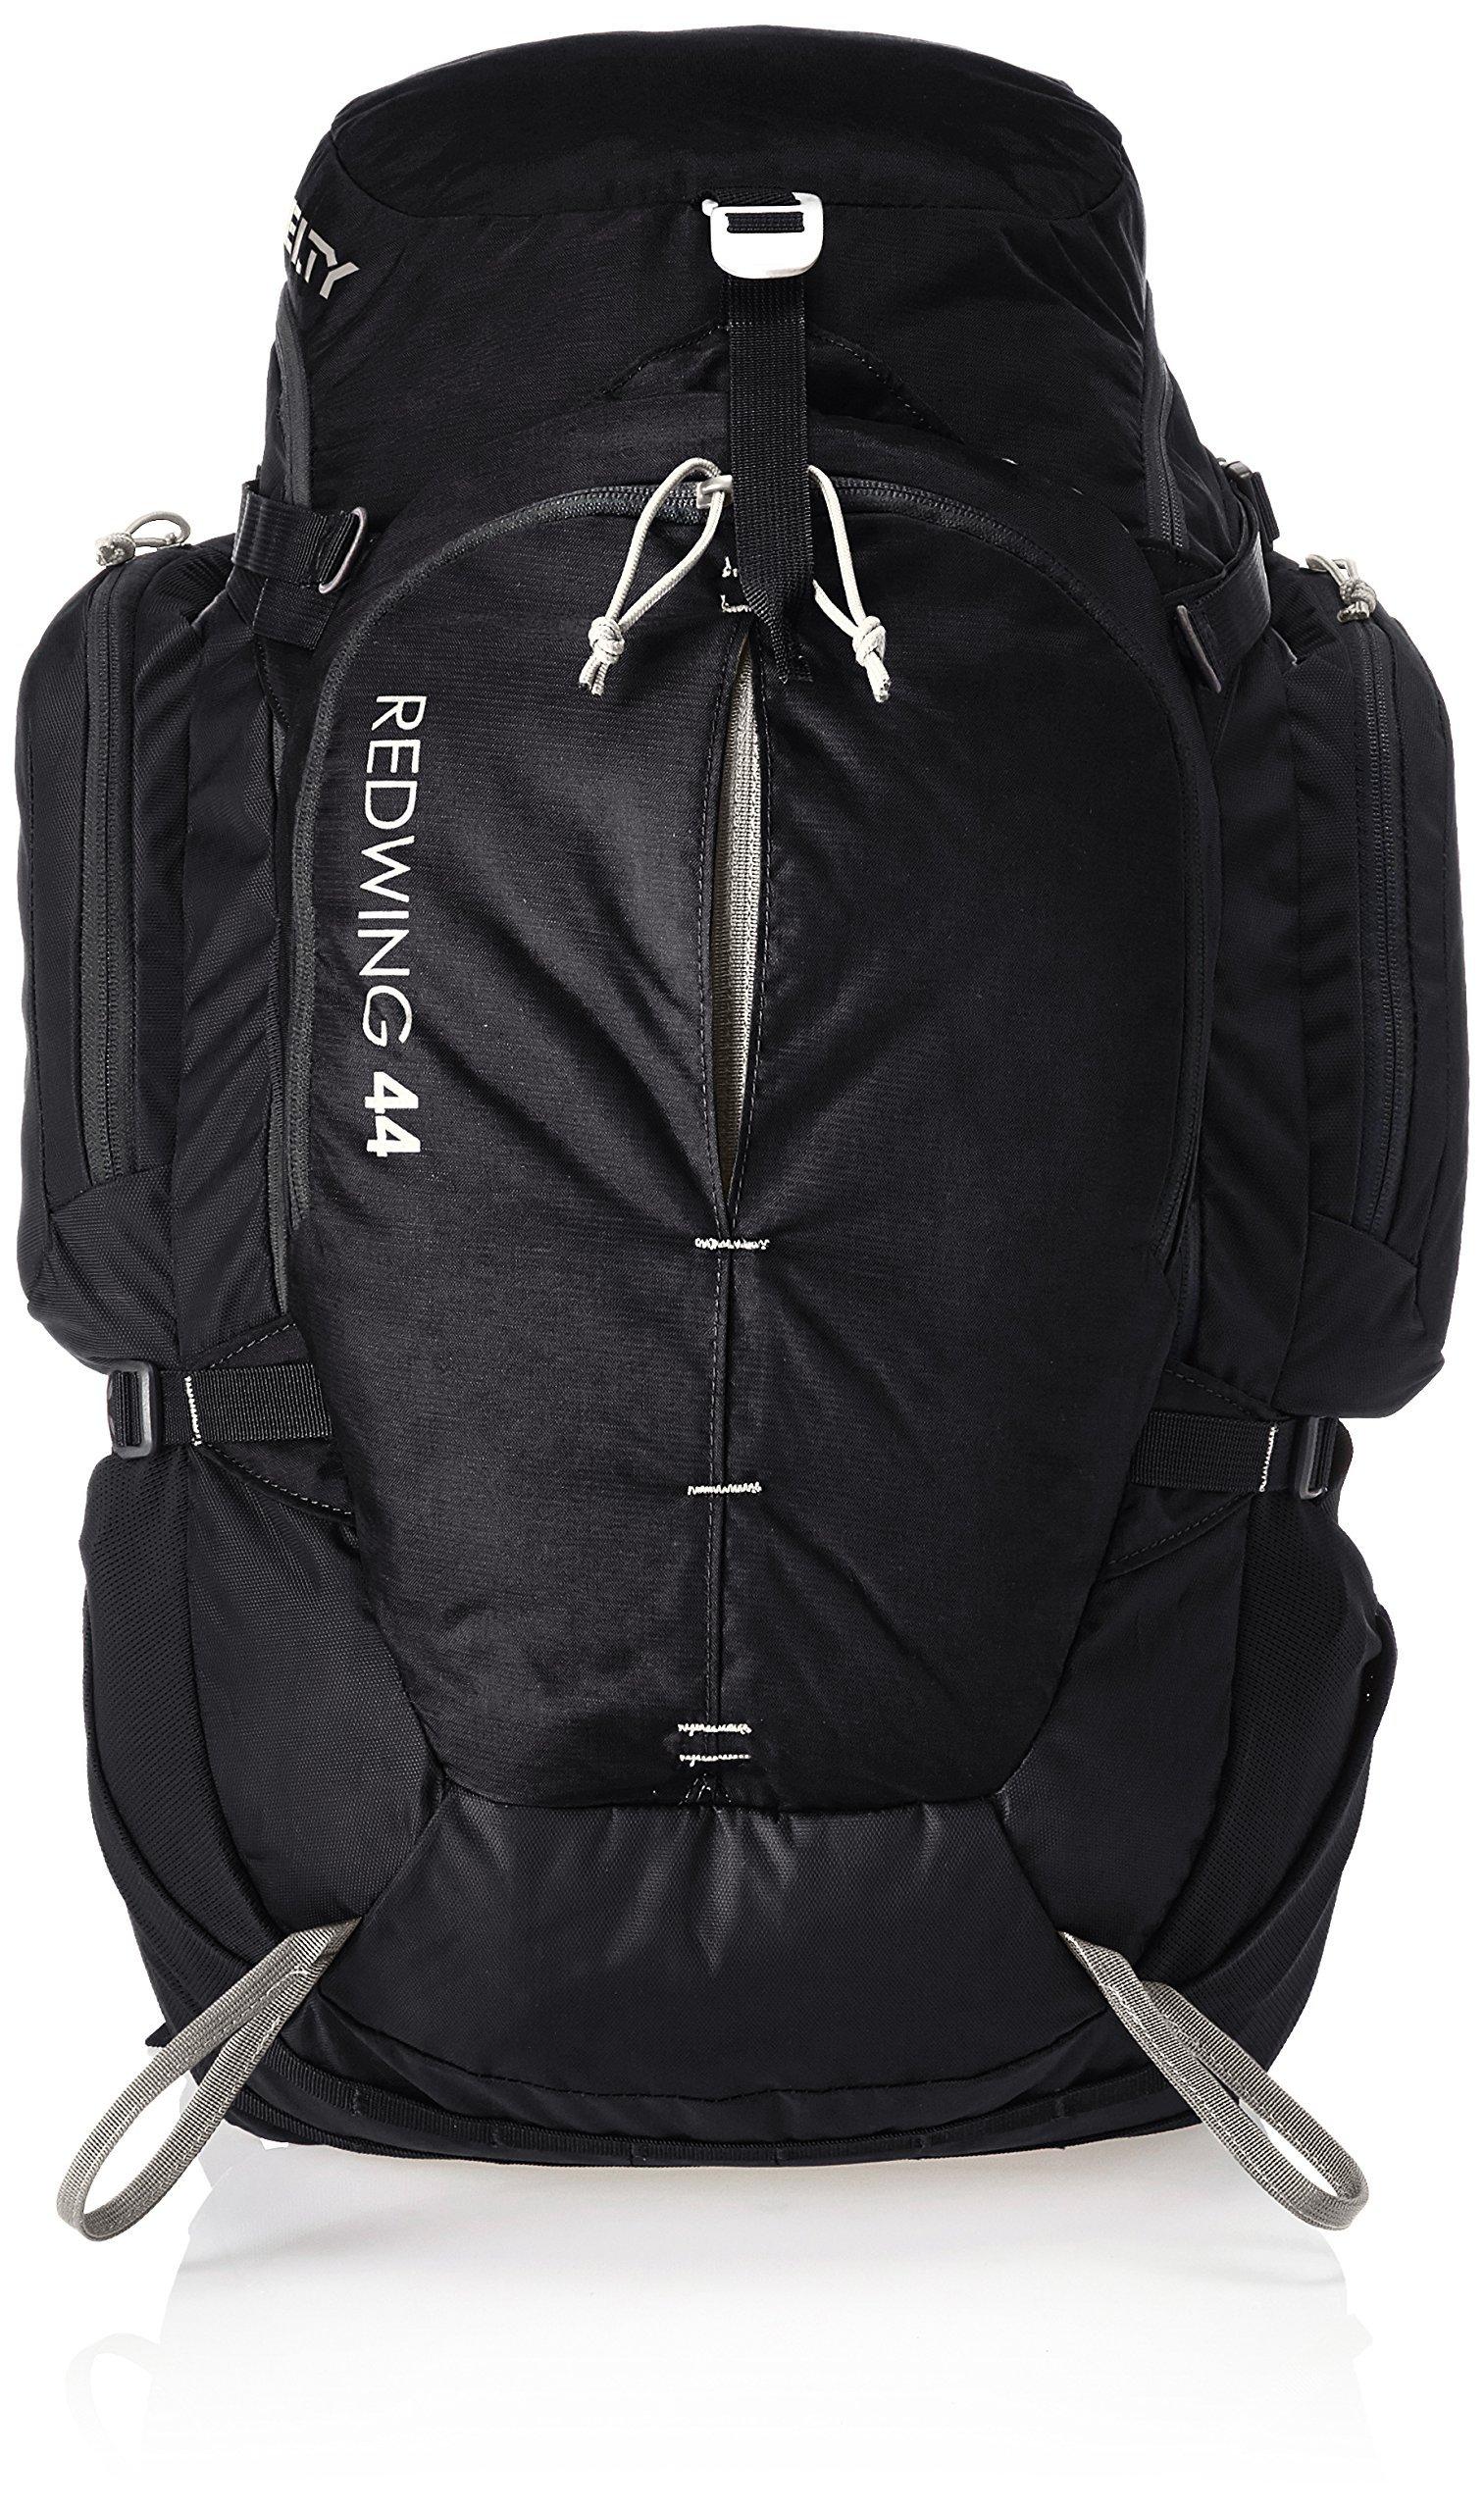 Kelty Redwing 44 Backpack, Black by Kelty